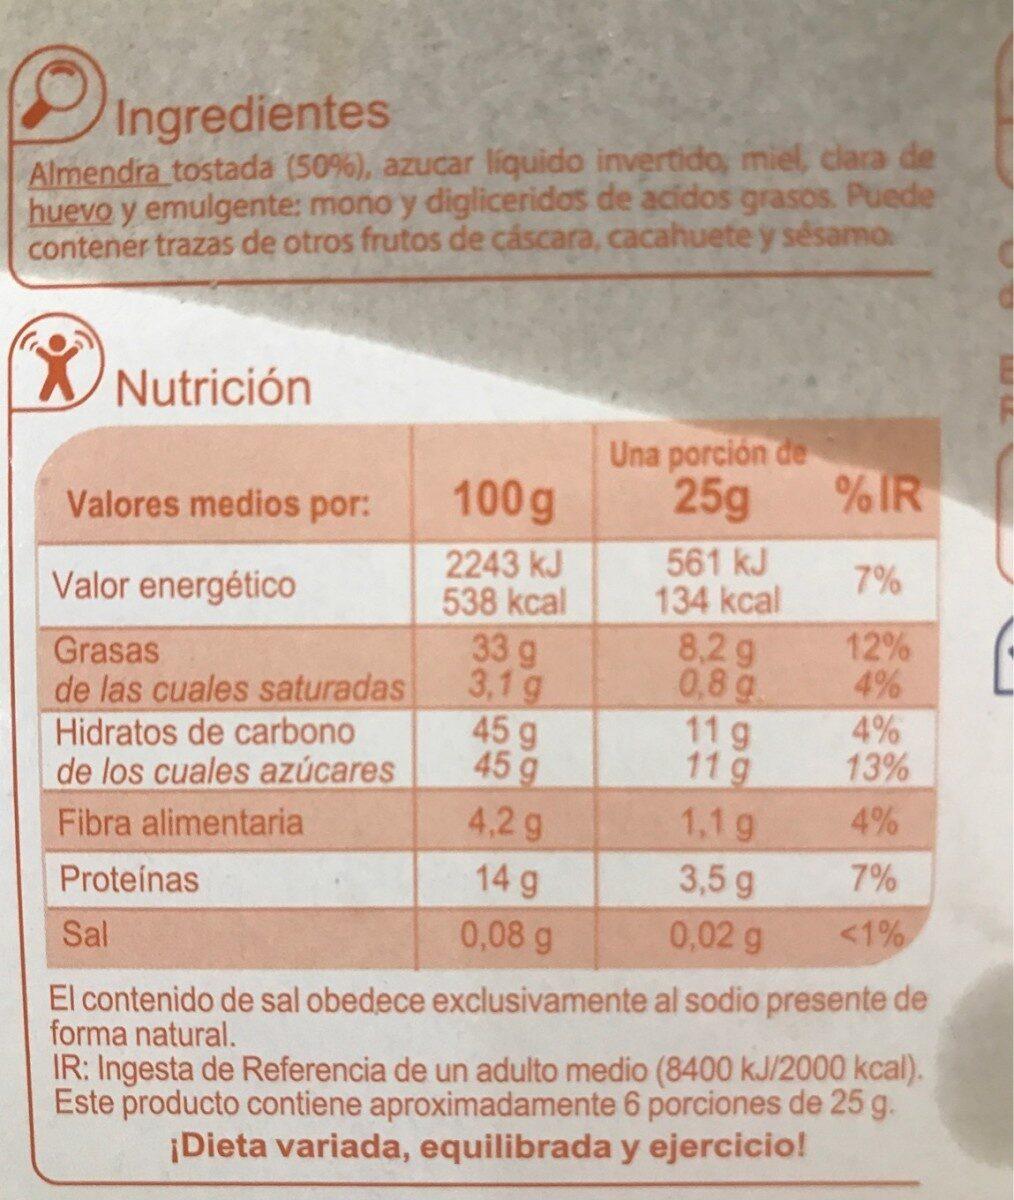 Turrón blando - Informations nutritionnelles - fr